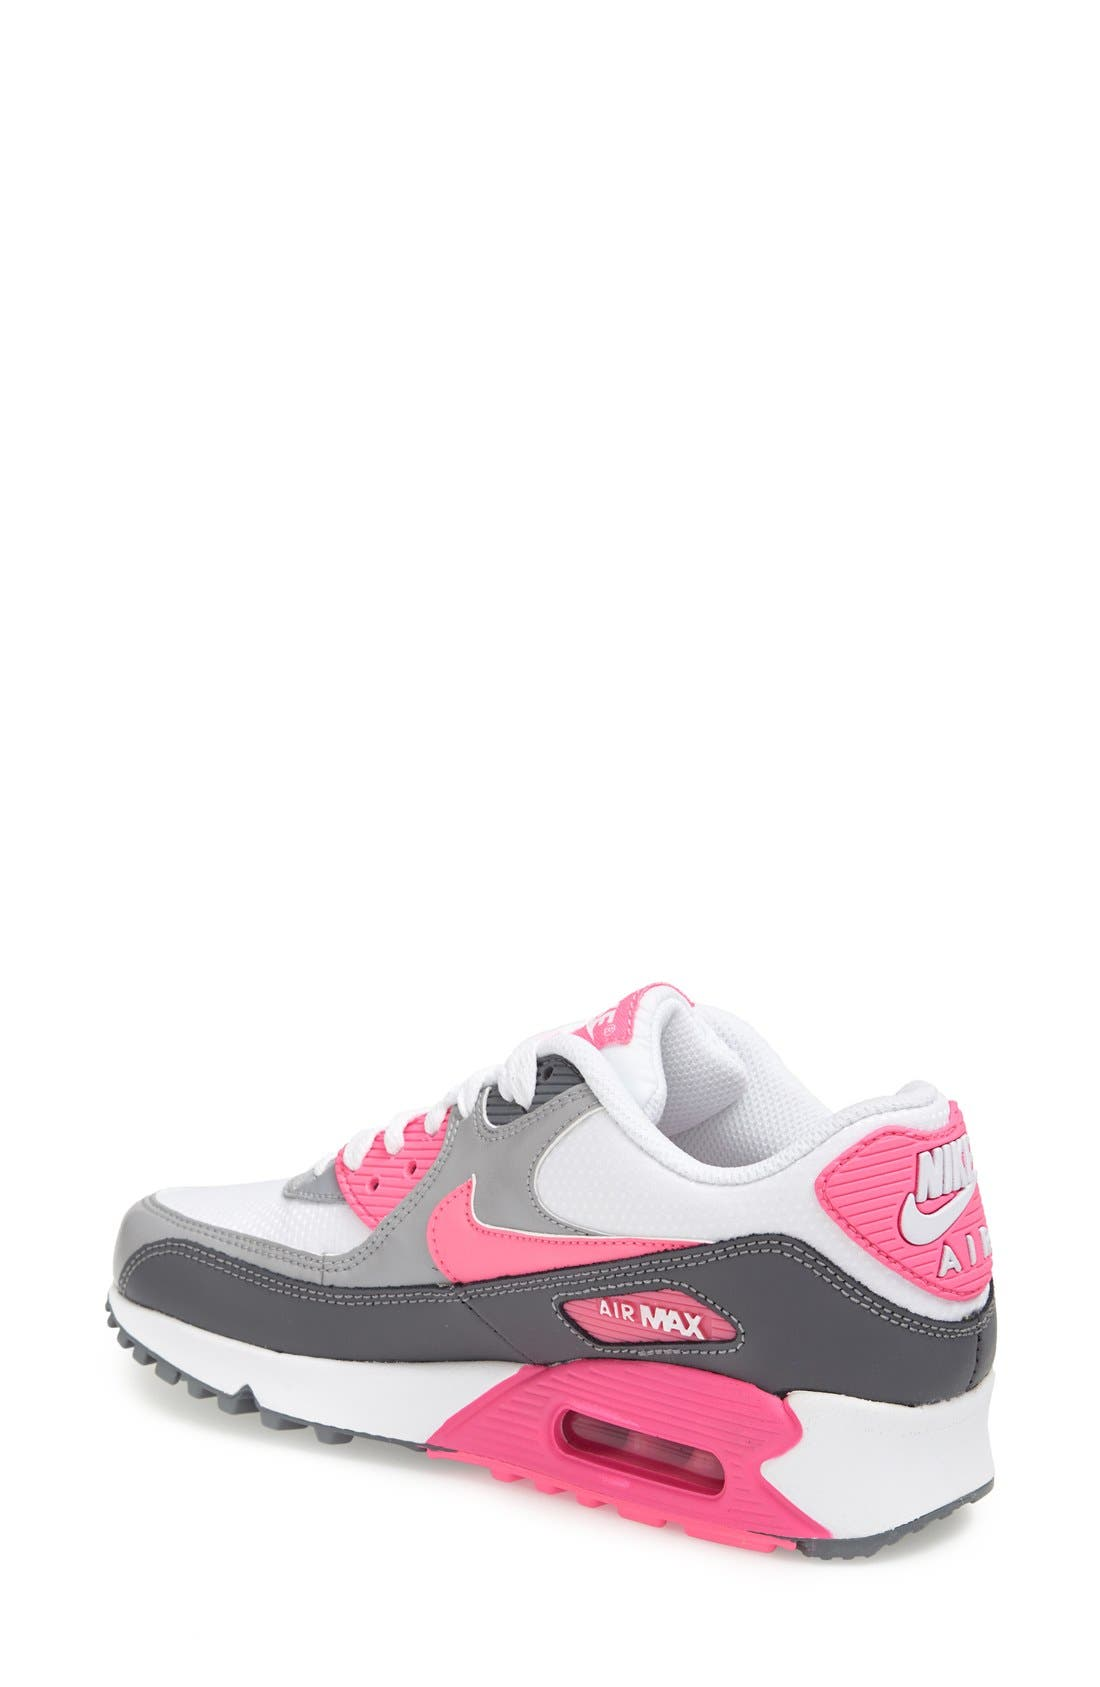 Alternate Image 2  - Nike 'Air Max - Essential' Sneaker (Women)